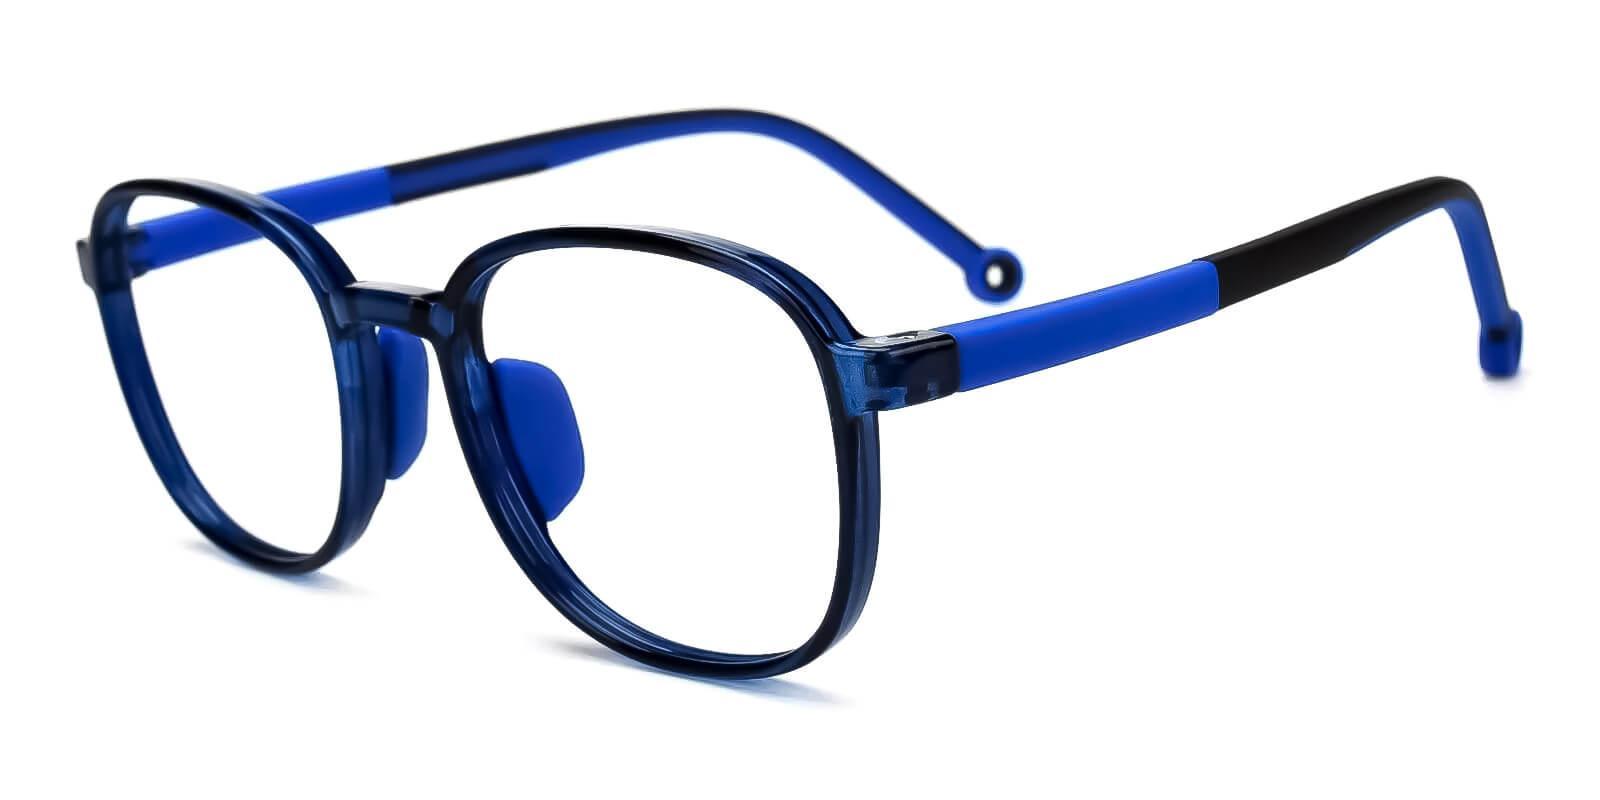 Kids-Astute Blue TR Eyeglasses , Fashion , UniversalBridgeFit Frames from ABBE Glasses